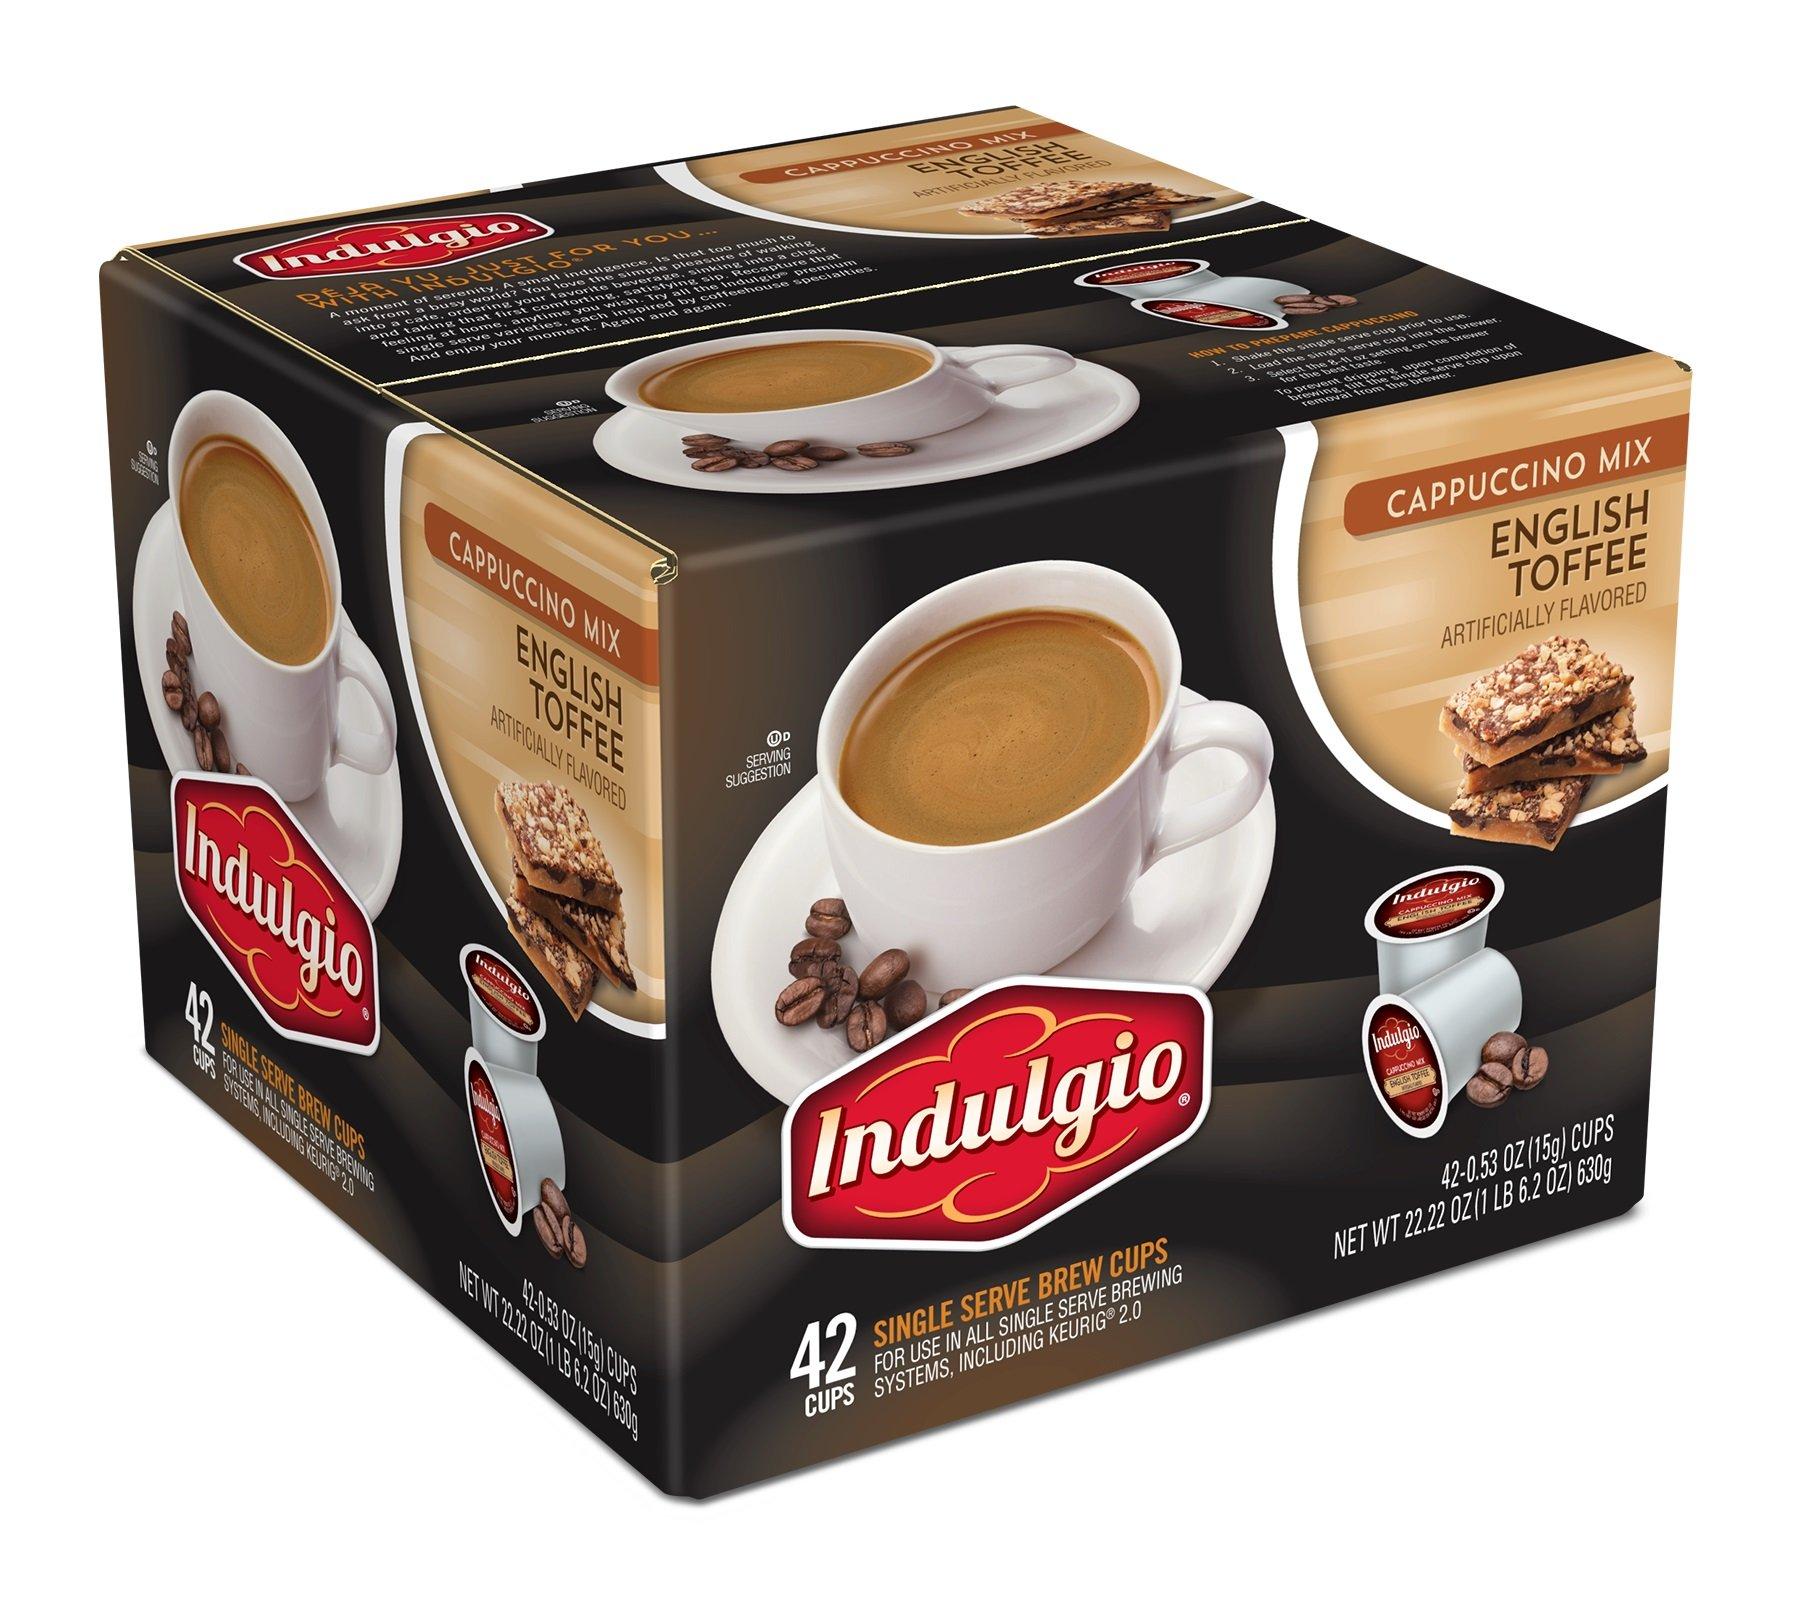 Indulgio Cappuccino Sweet & Salty Caramel 12 Count Single Serve